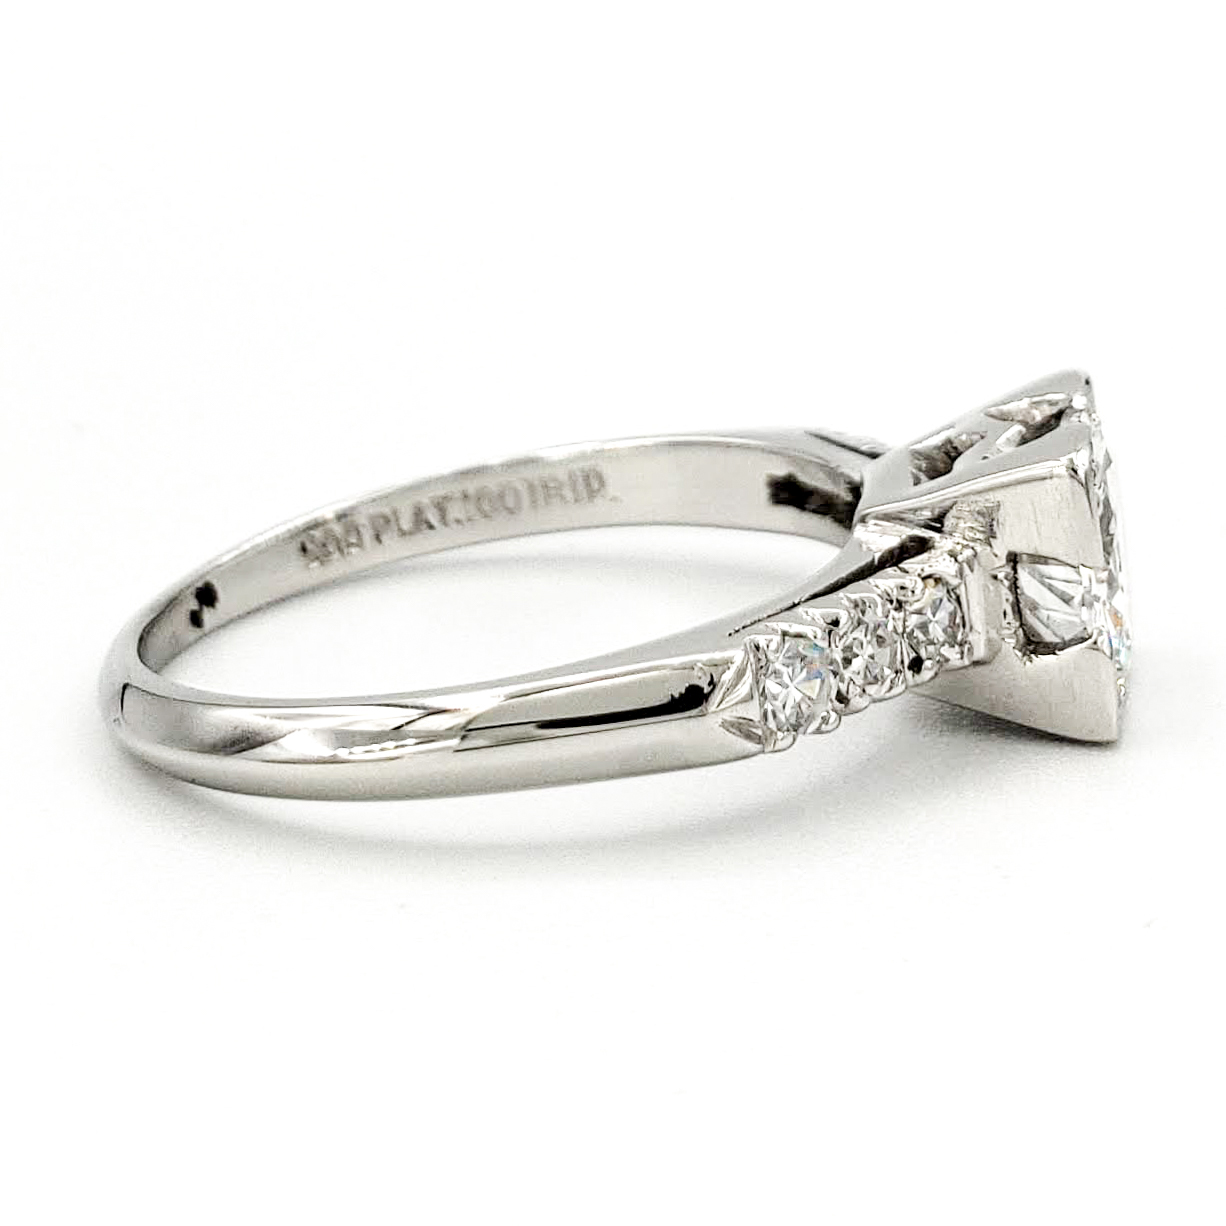 vintage-platinum-engagement-ring-with-0-63-carat-old-european-cut-diamond-egl-e-si1